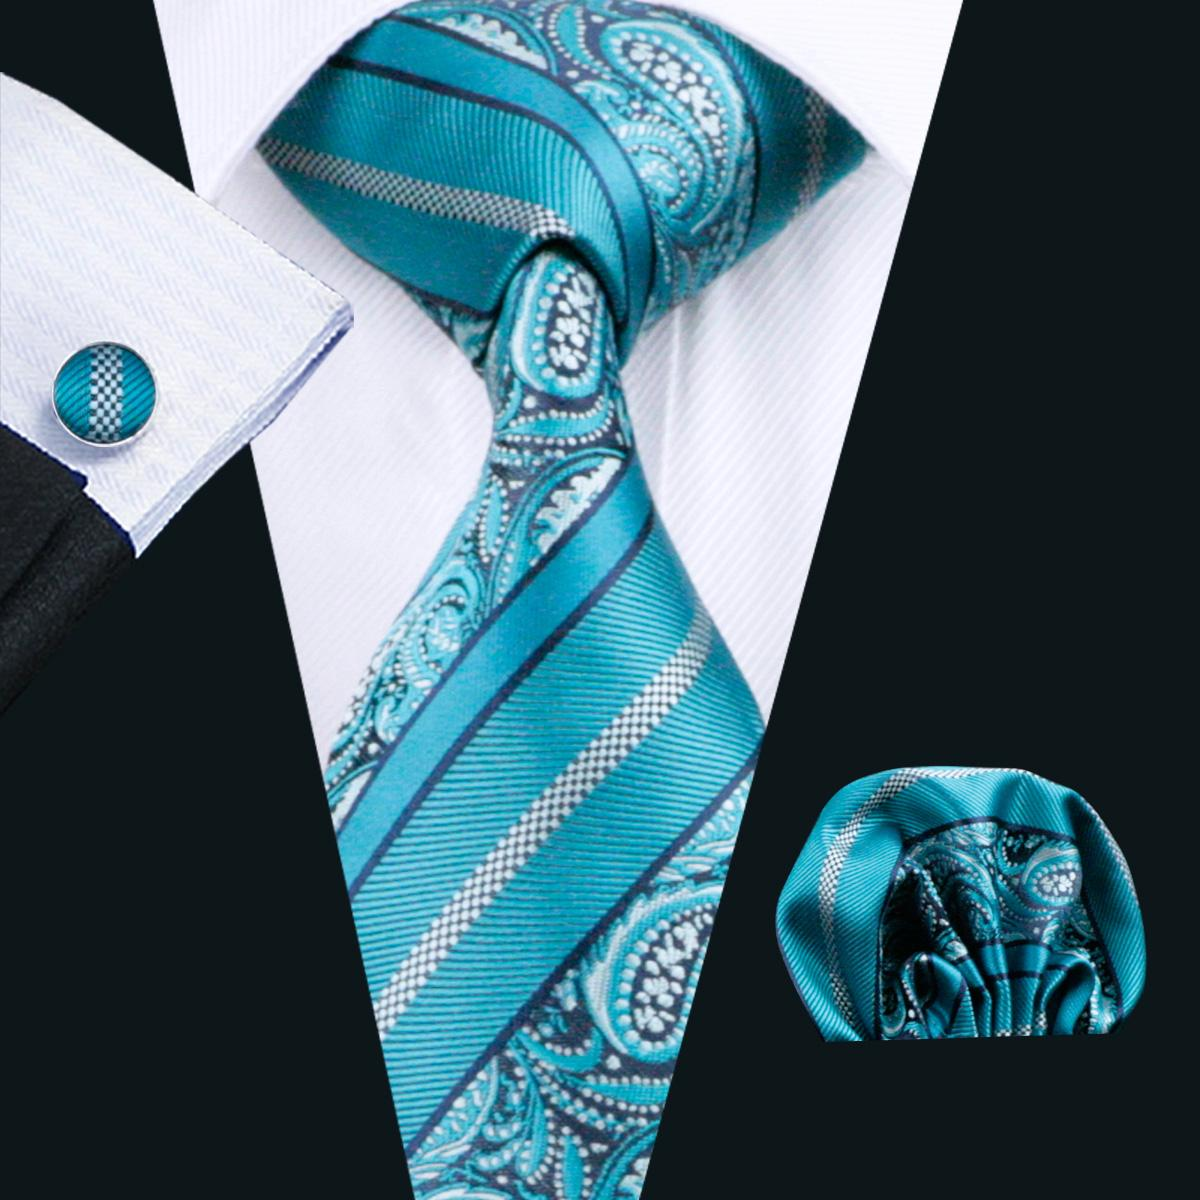 Teal Mens Ties Hanky Gemelos Set Jacquard Corbata tejida Set Seda Mens Set Business Work Formal N-0455